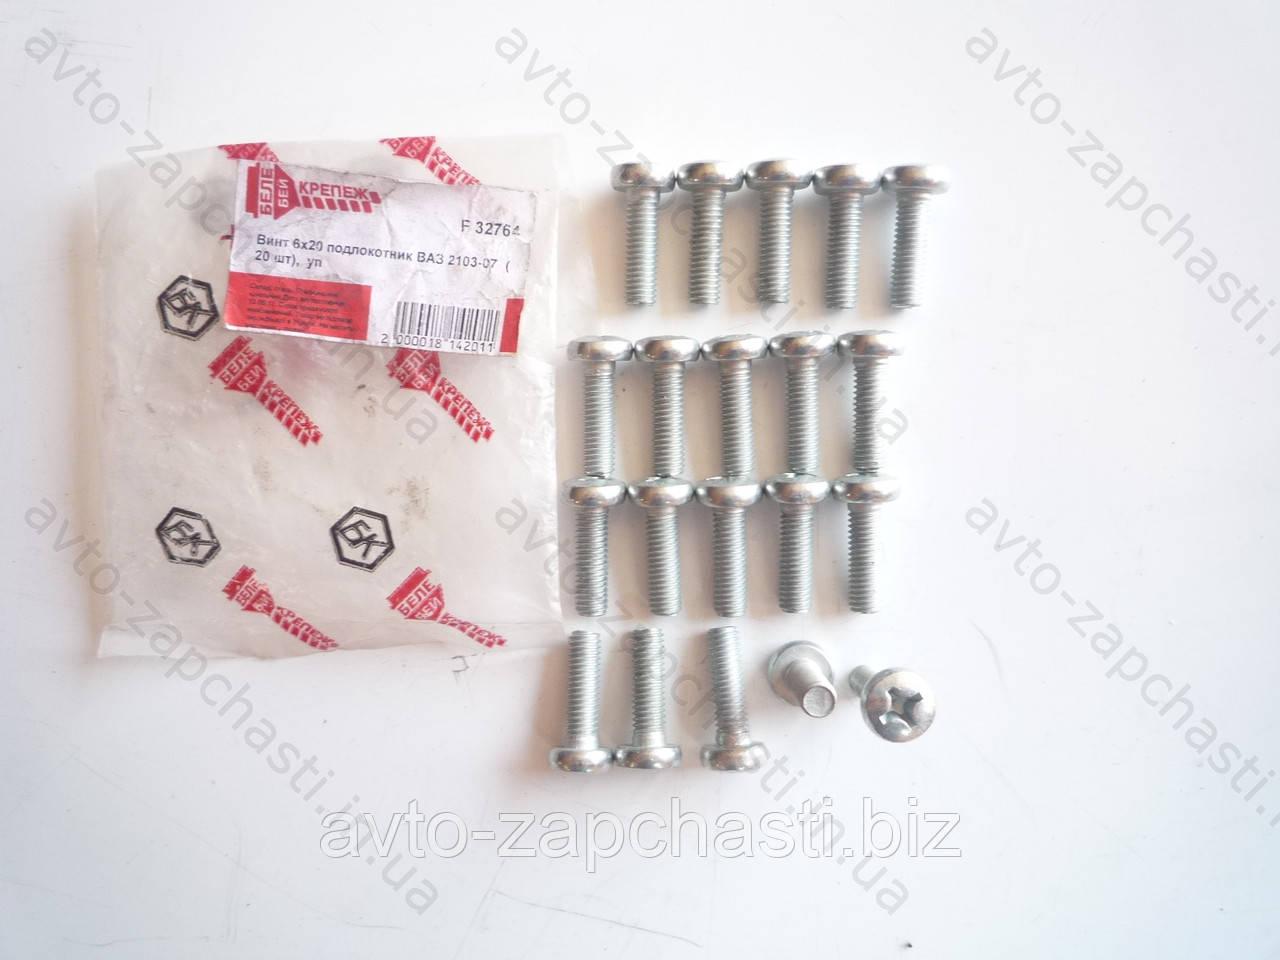 Винт 6х20 подлокотник ВАЗ 2103-07 (20 шт) (пакет) (F 32764)